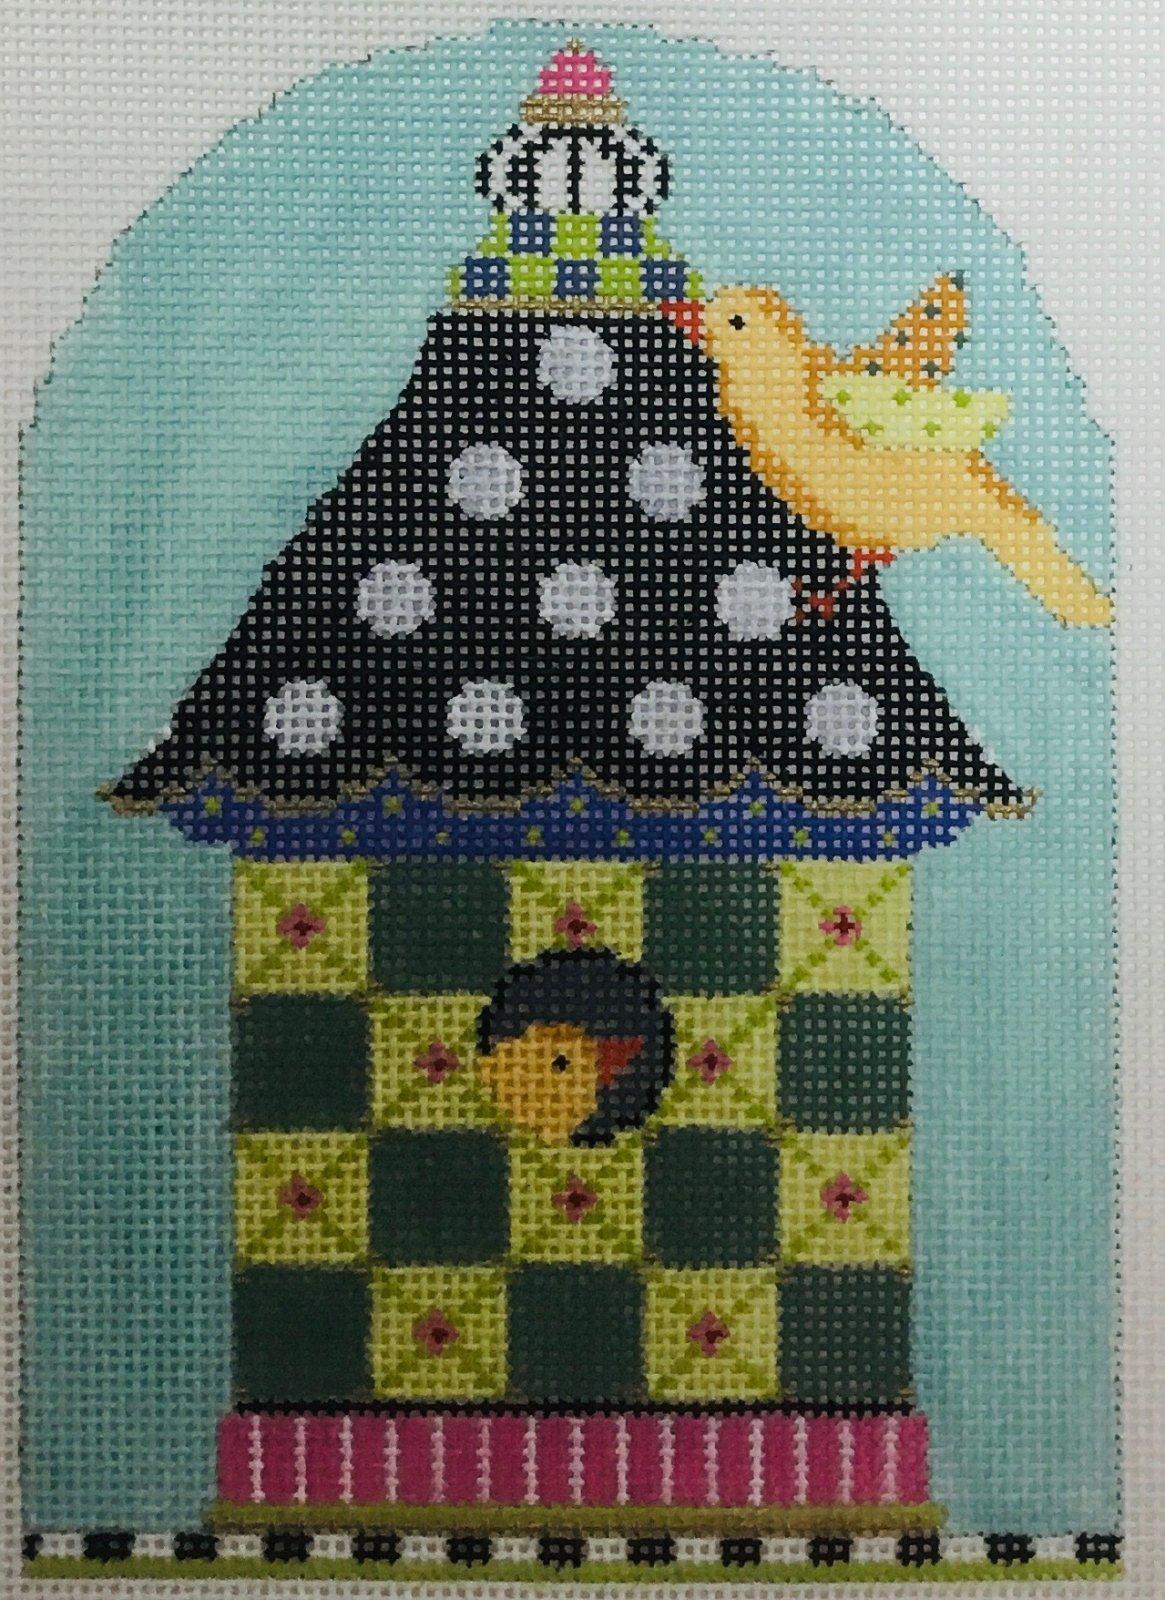 Green Checkers Bird House, 18M, 4x7.15